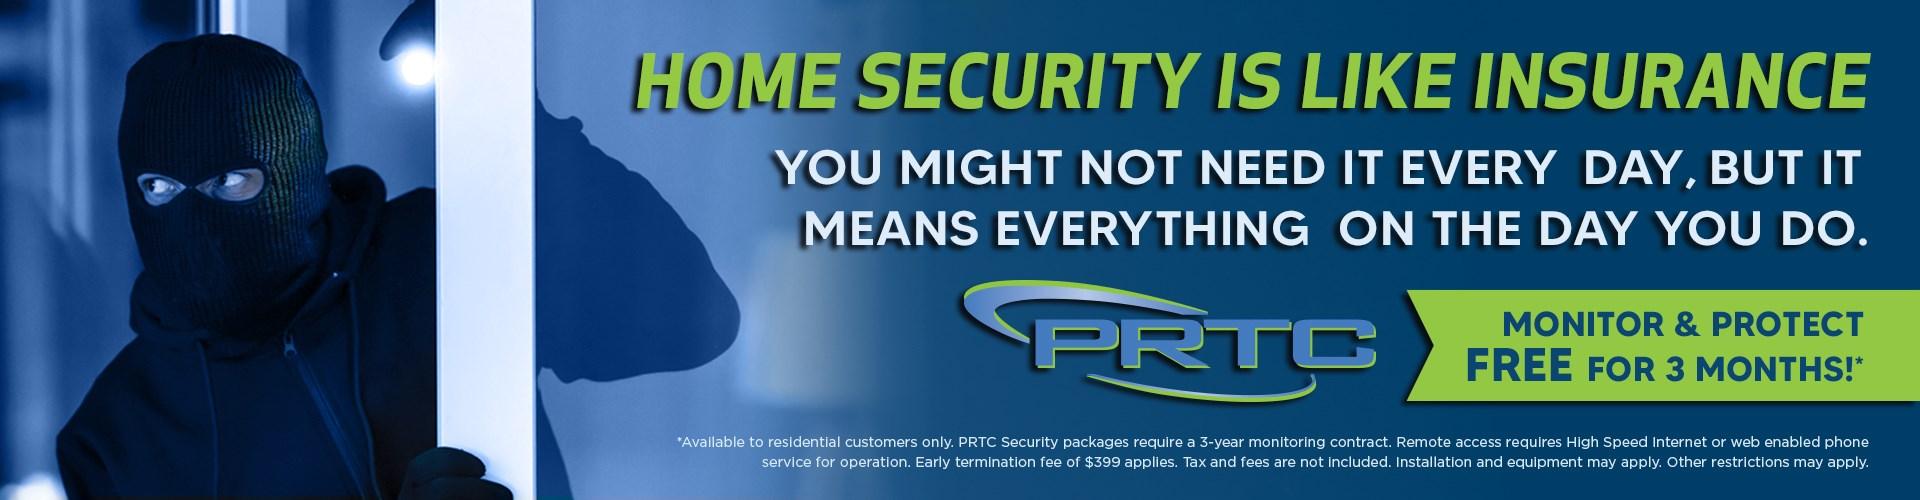 PRTC Security